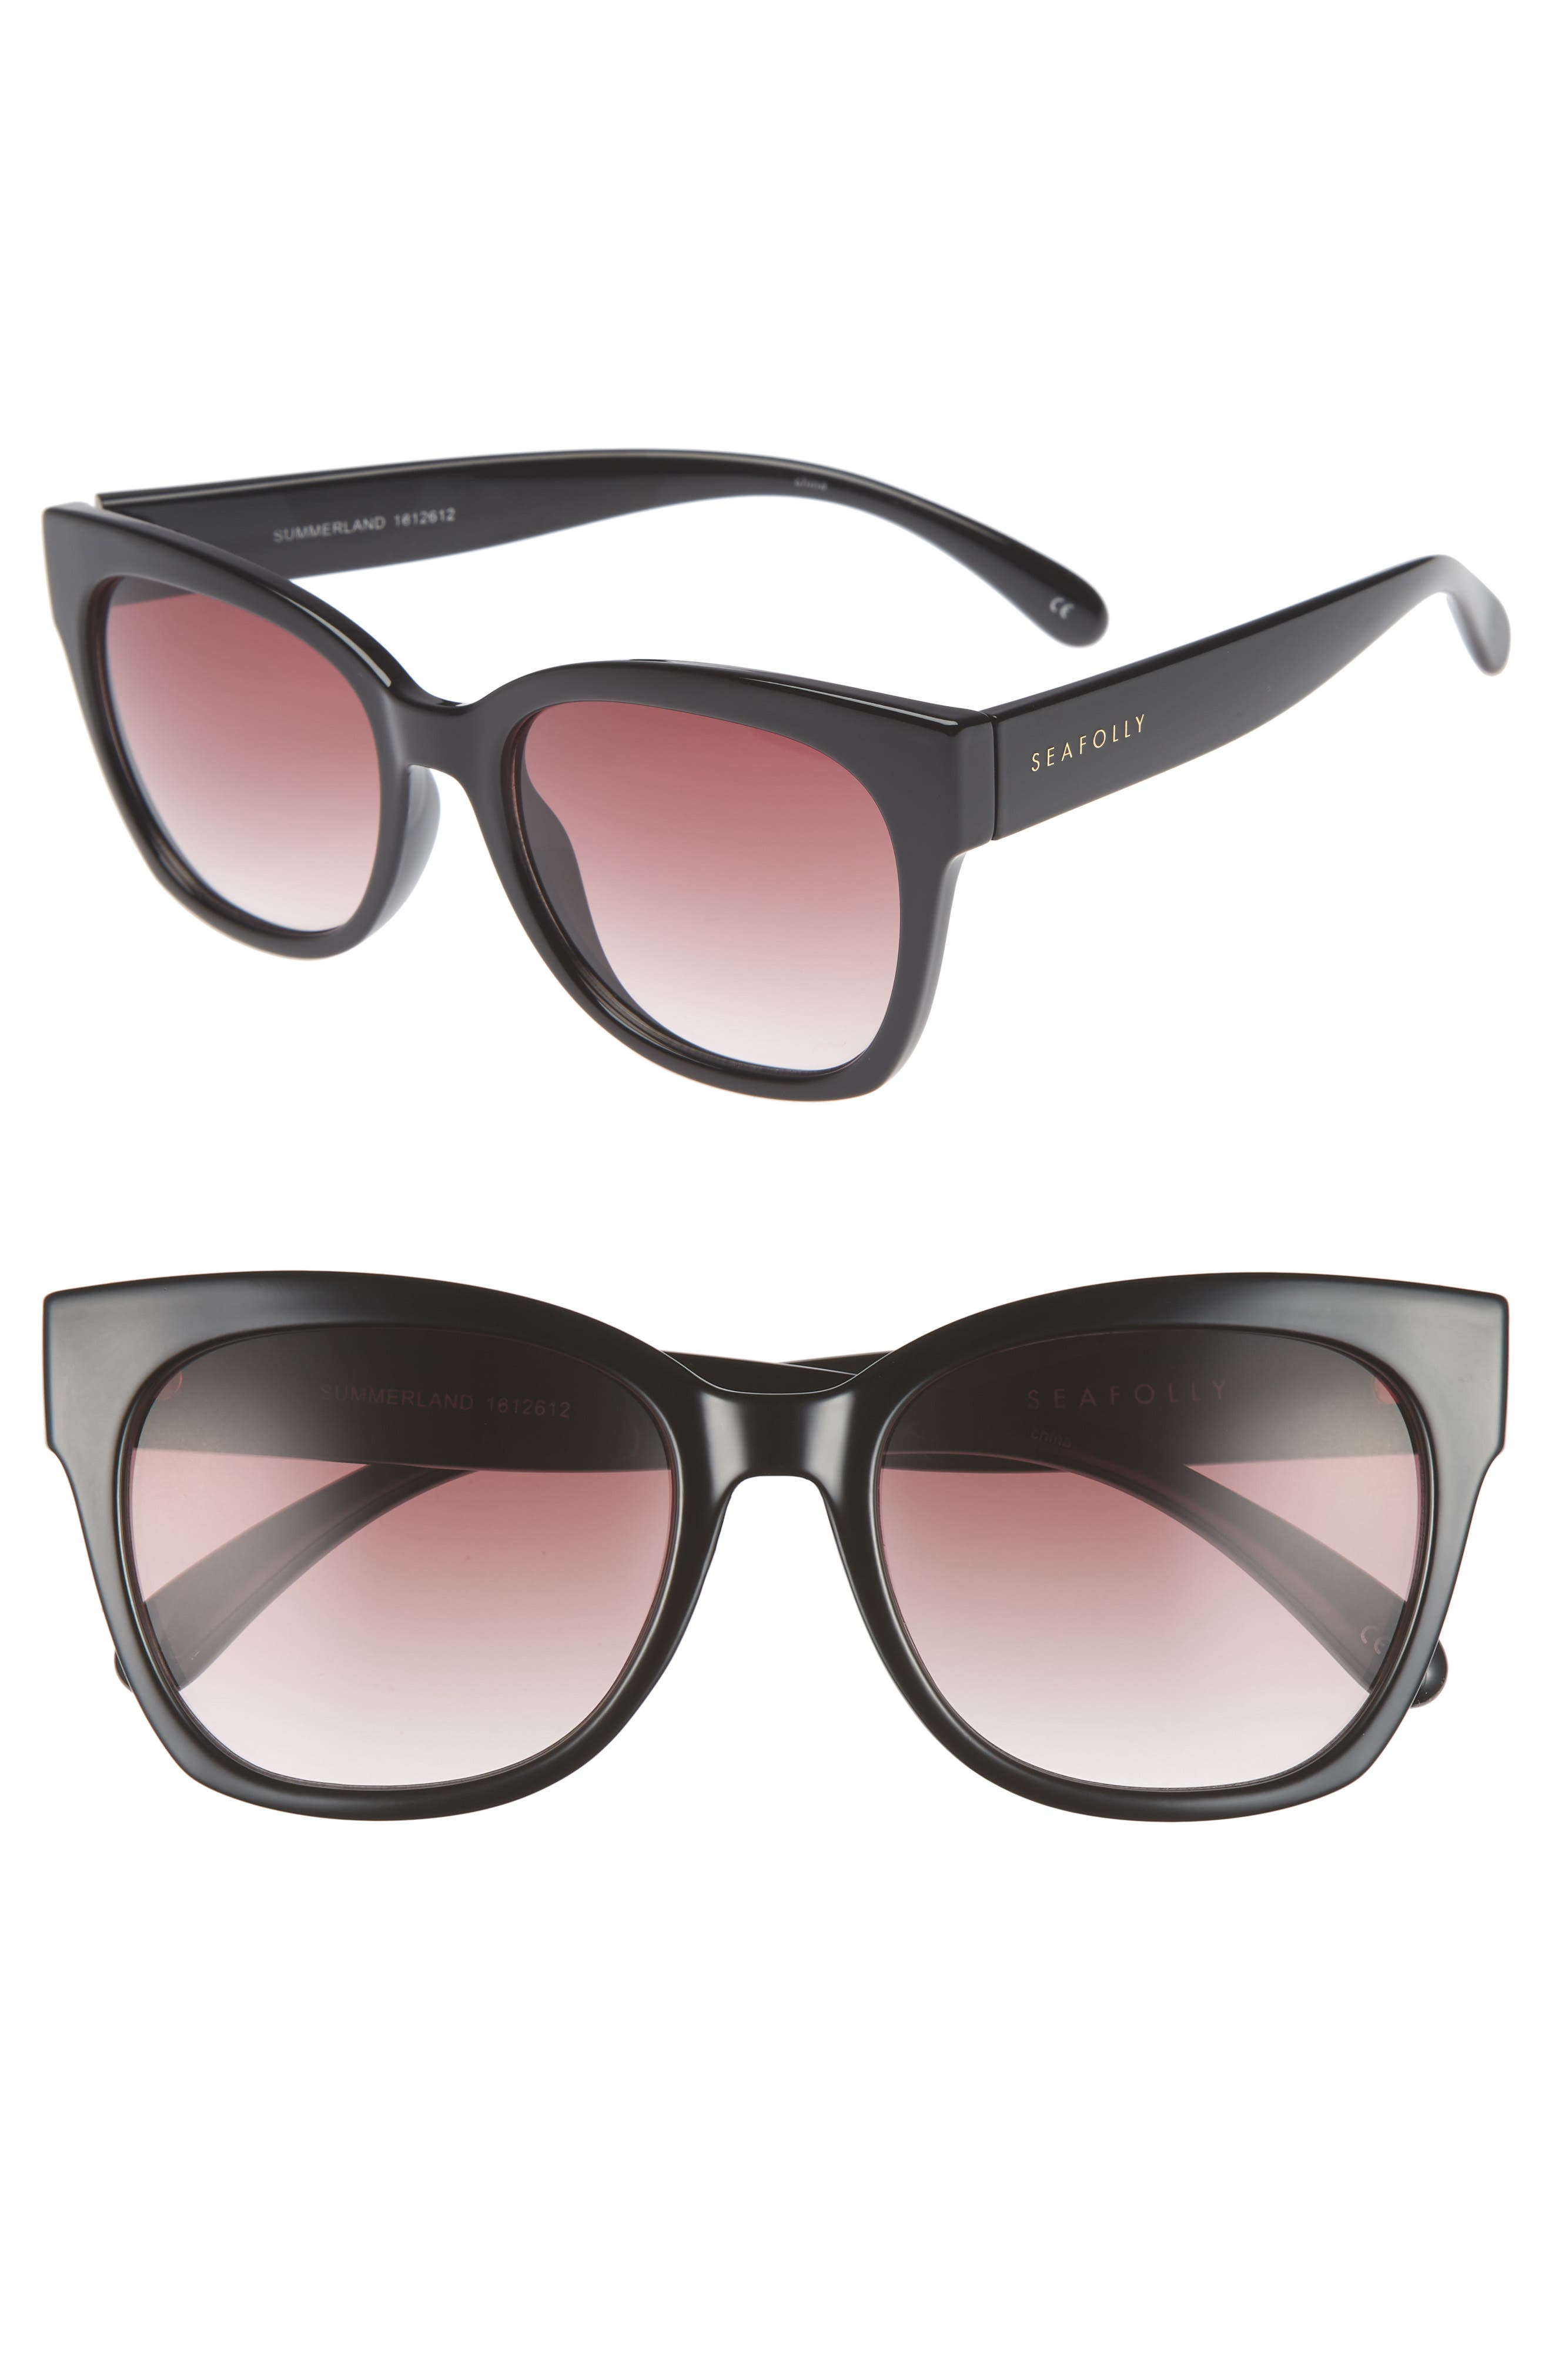 Summerland 55mm Cat Eye Sunglasses,                             Main thumbnail 1, color,                             BLACK